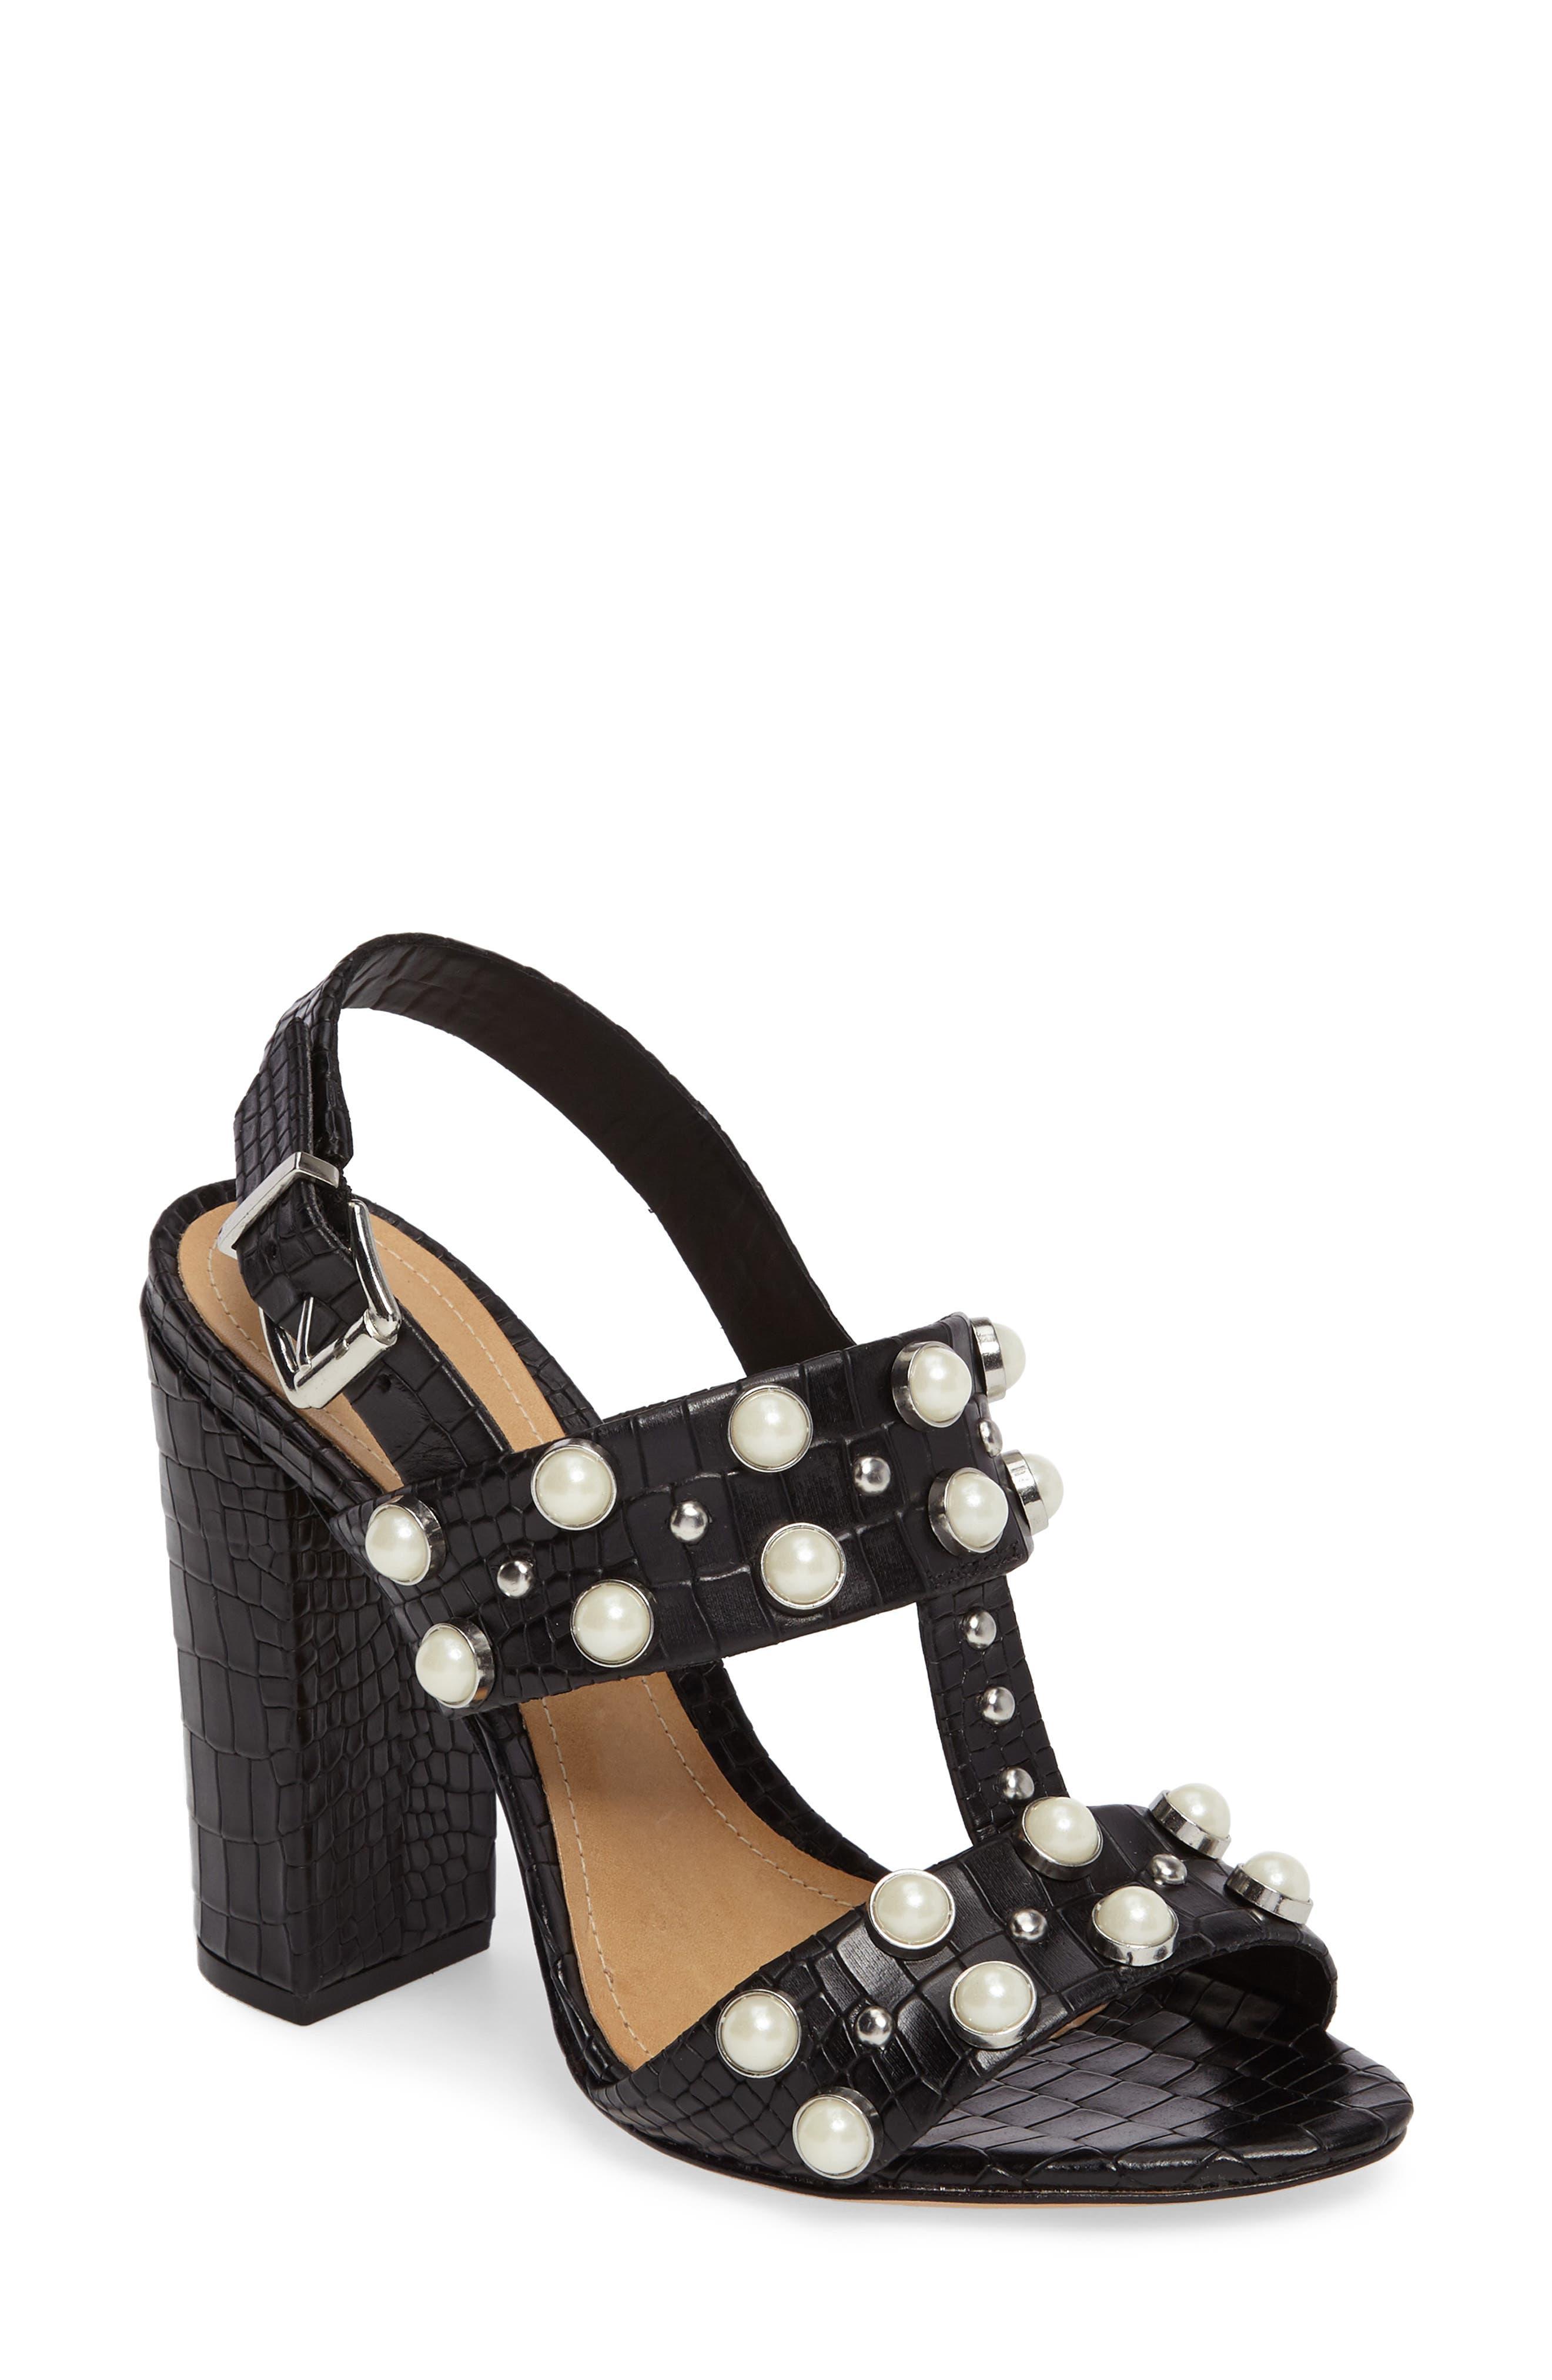 Zarita Imitation Pearl Embellished Sandal,                             Main thumbnail 1, color,                             001